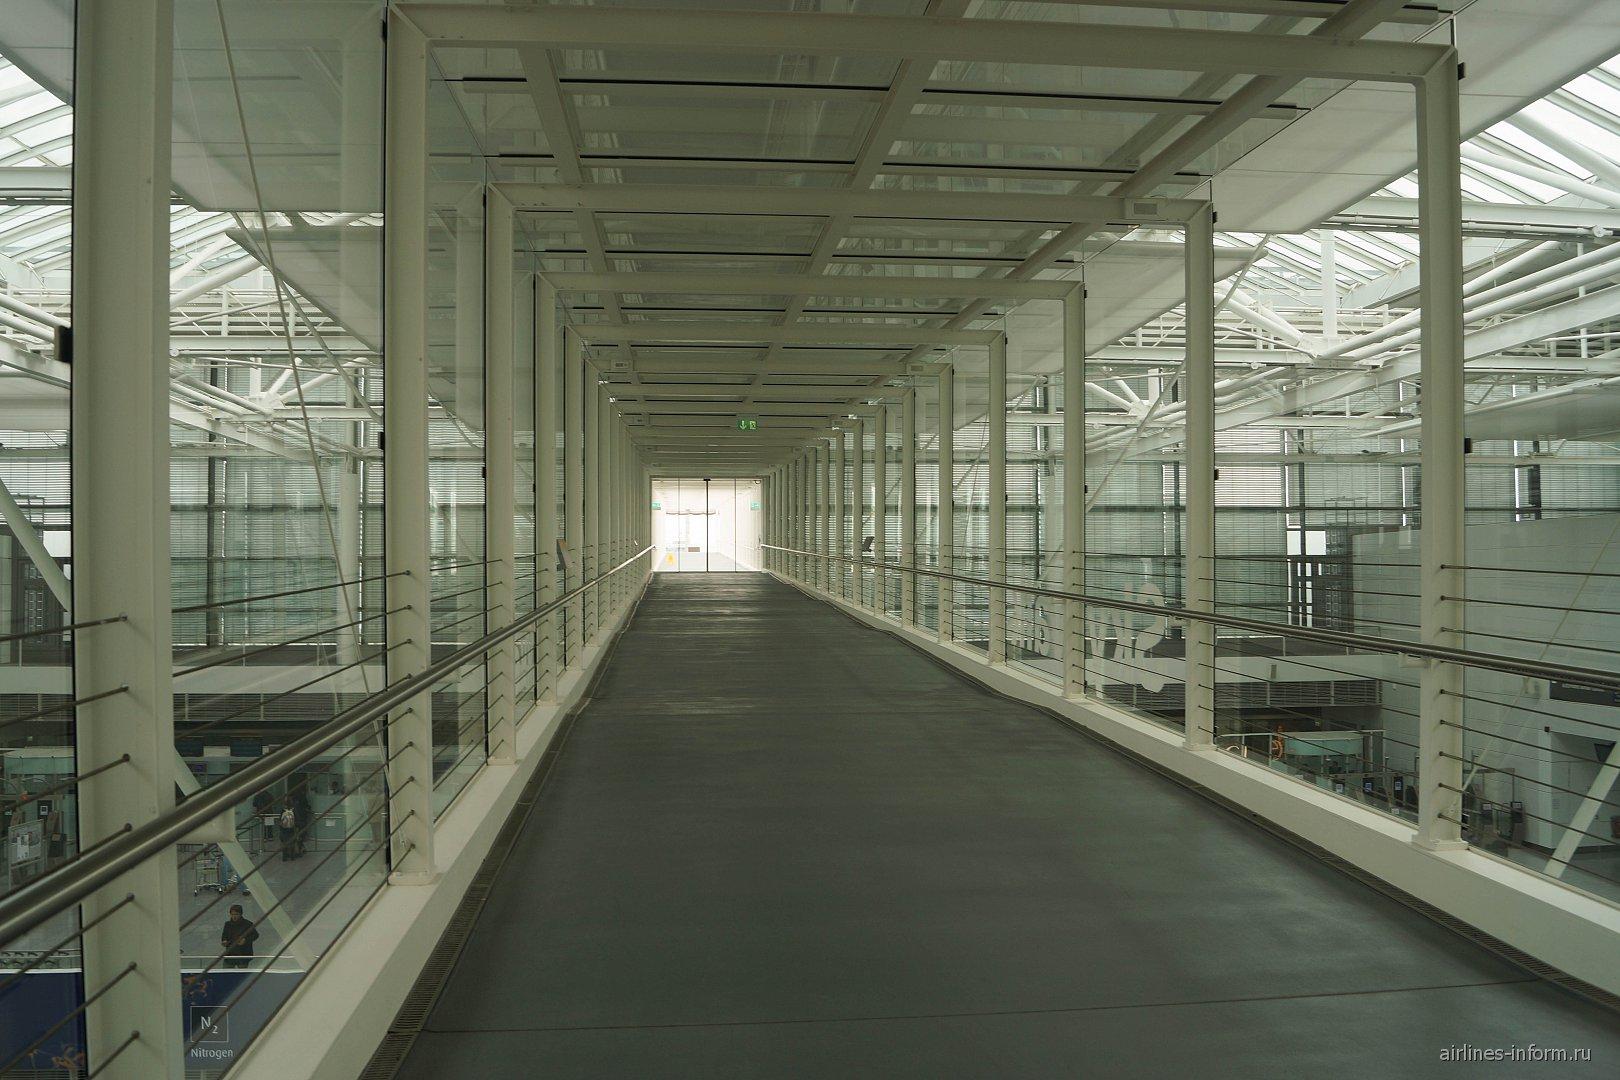 Коридор Skywalk в Терминале 2 аэропорта Мюнхен